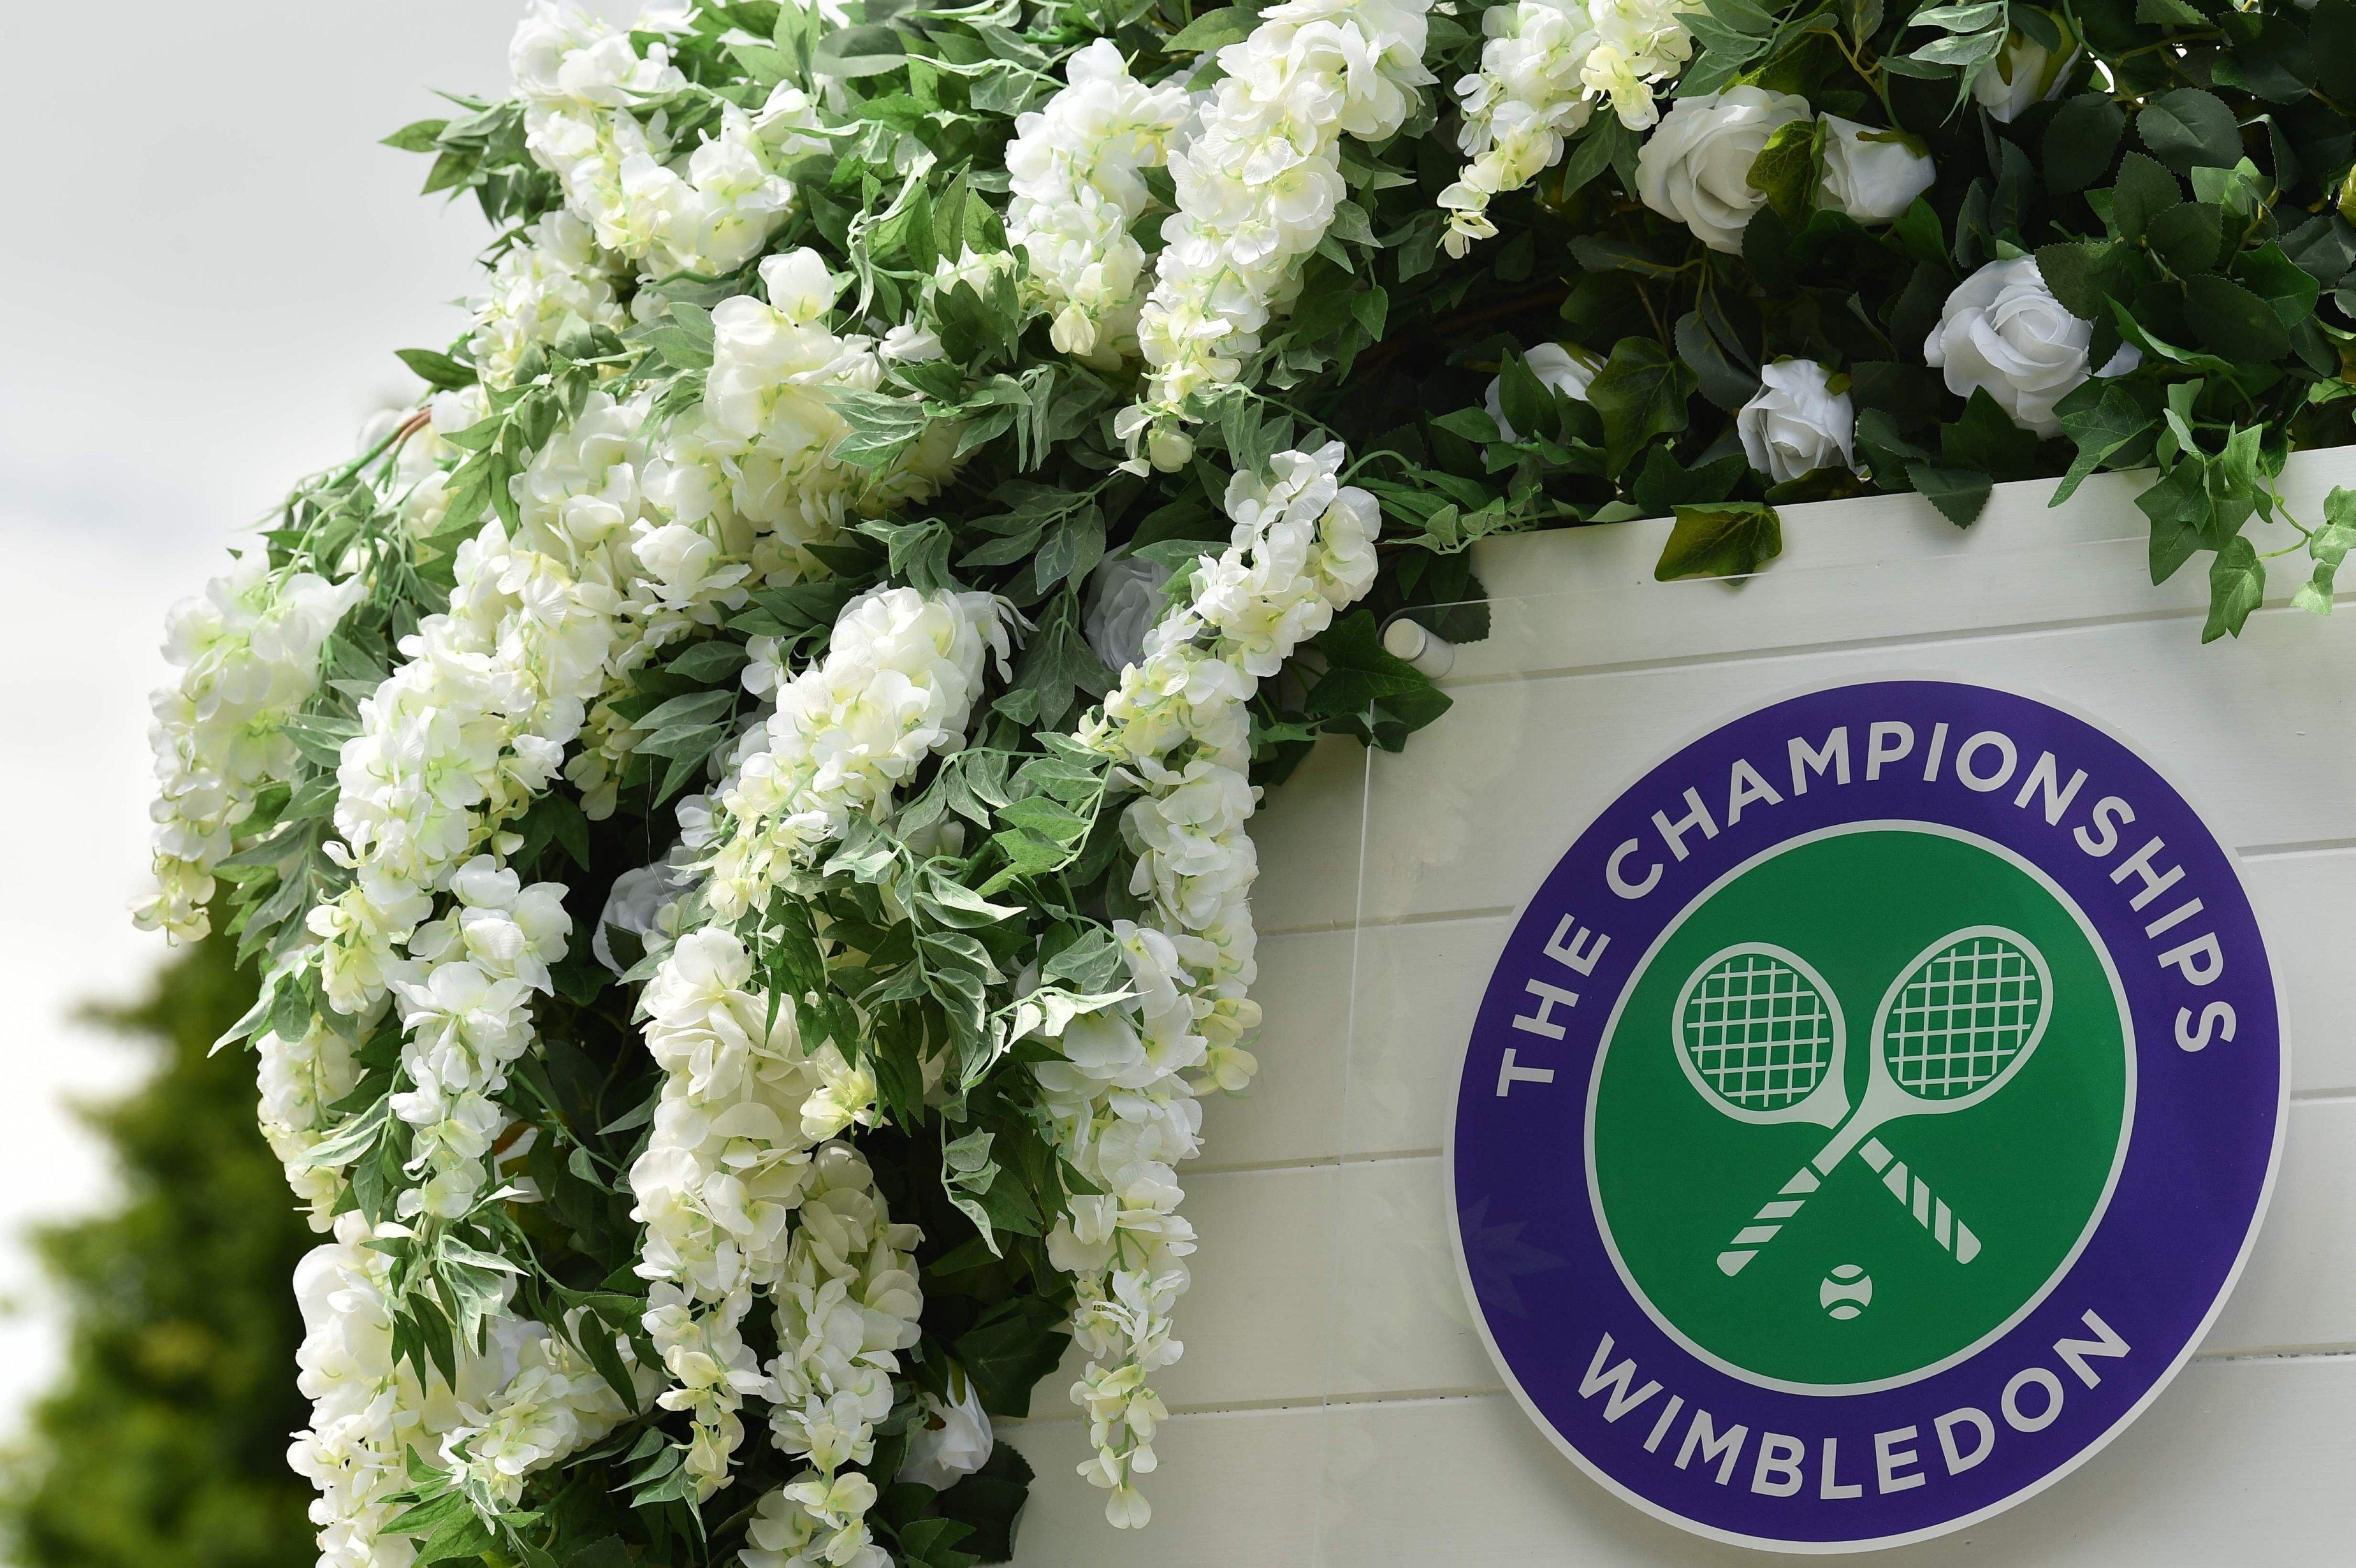 Tennis, Wimbledon 2019 in diretta esclusiva Sky Sport con 6 canali dedicati